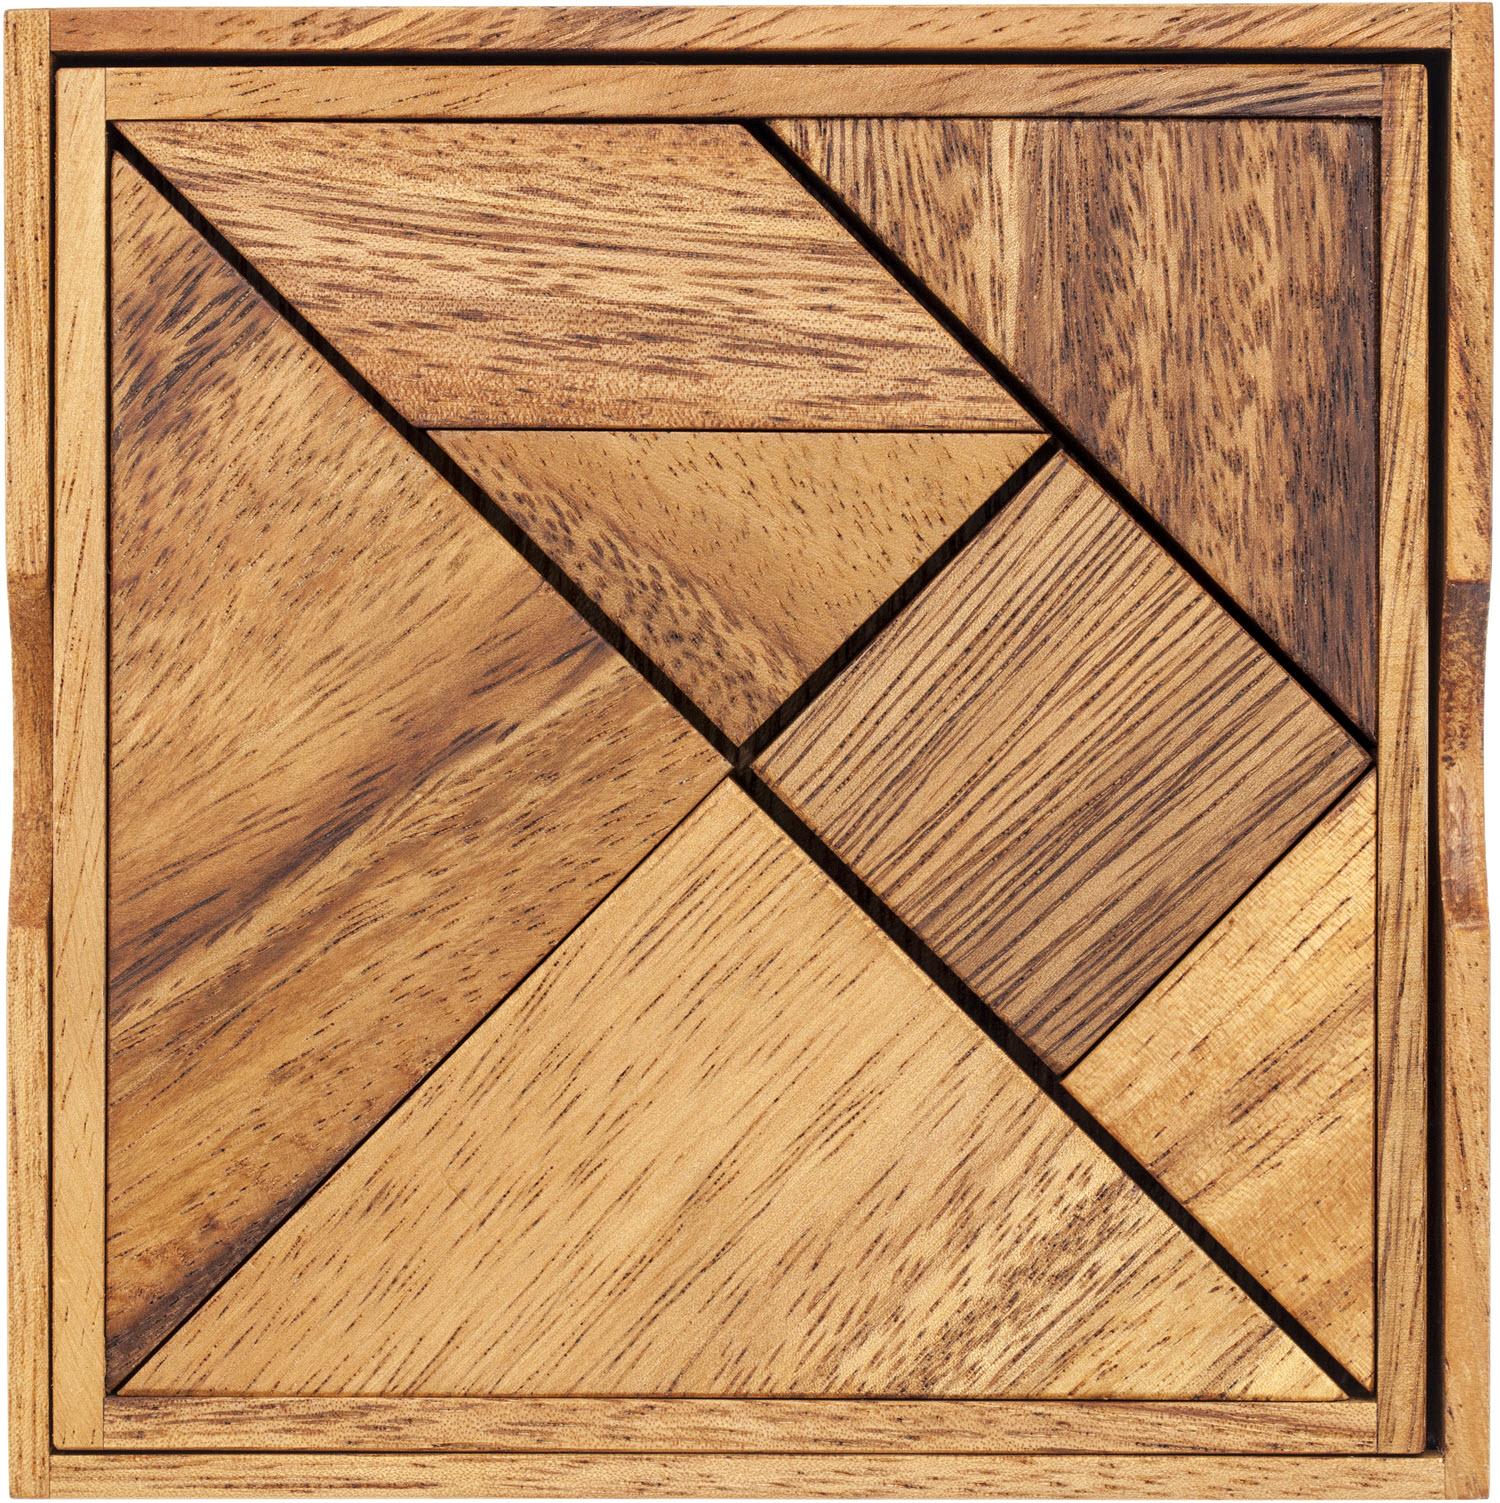 Wooden Tangram Puzzle.